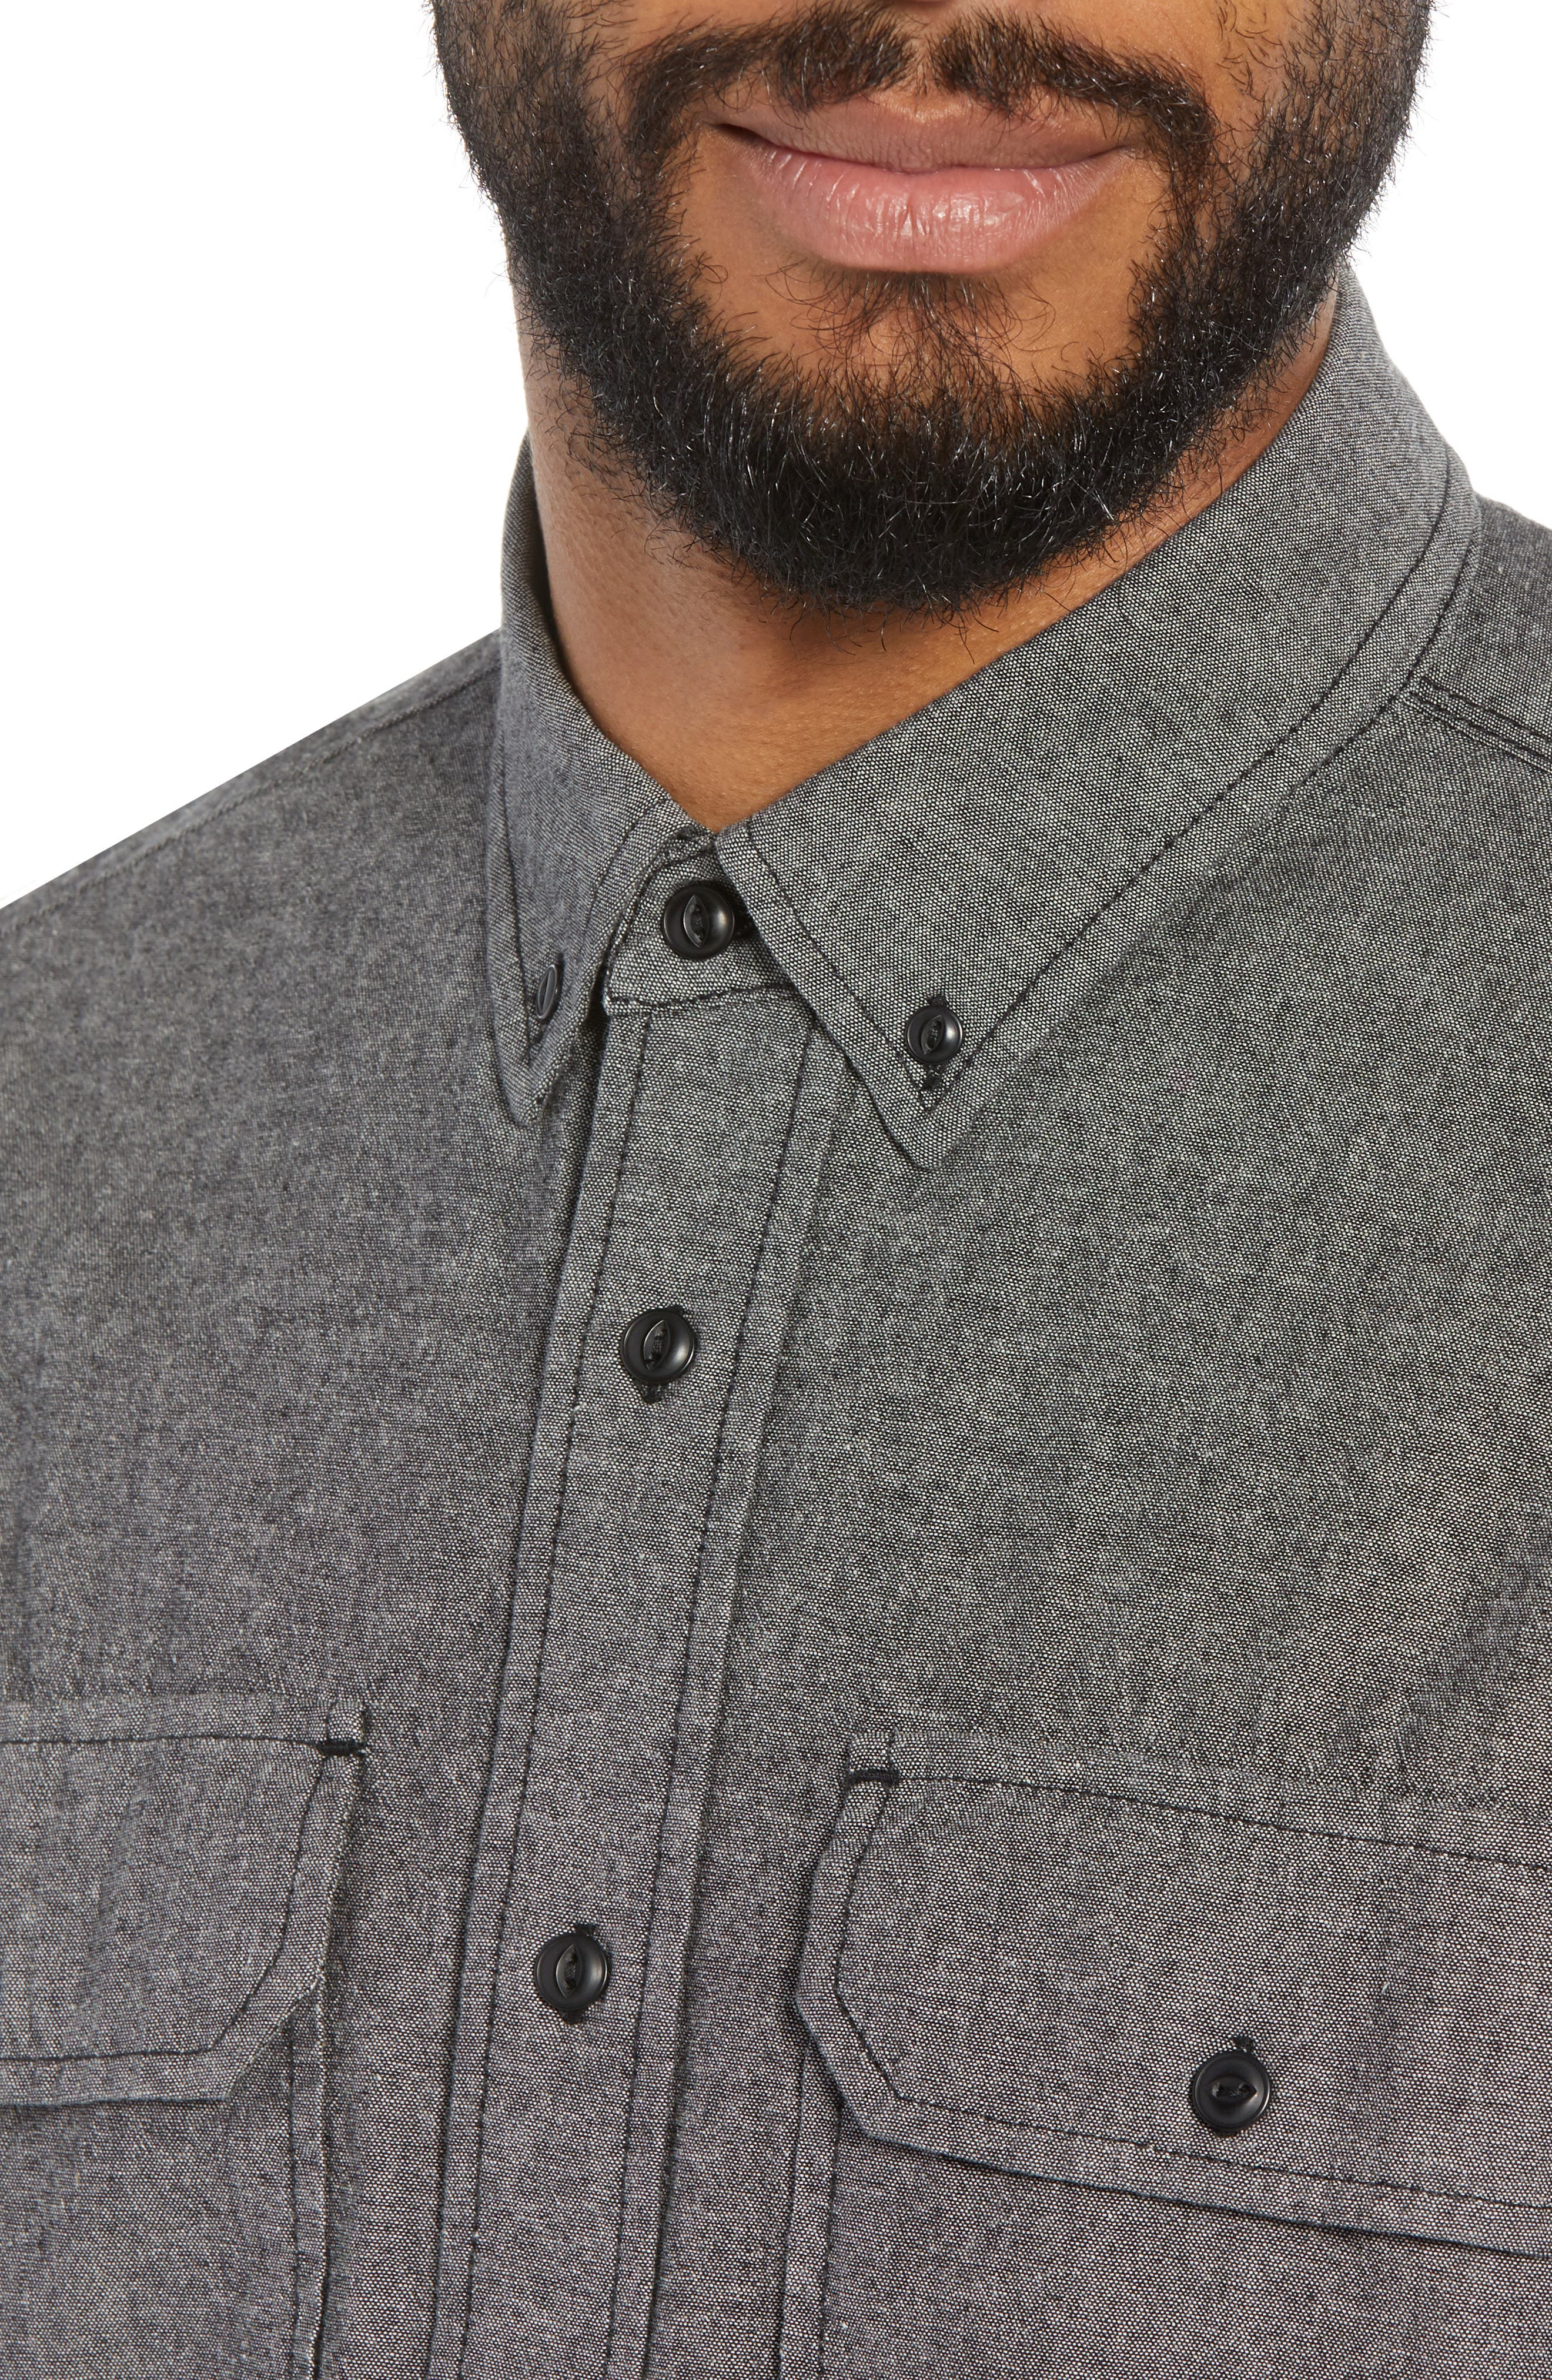 Hudson Regular Fit Chambray Sport Shirt,                             Alternate thumbnail 4, color,                             035